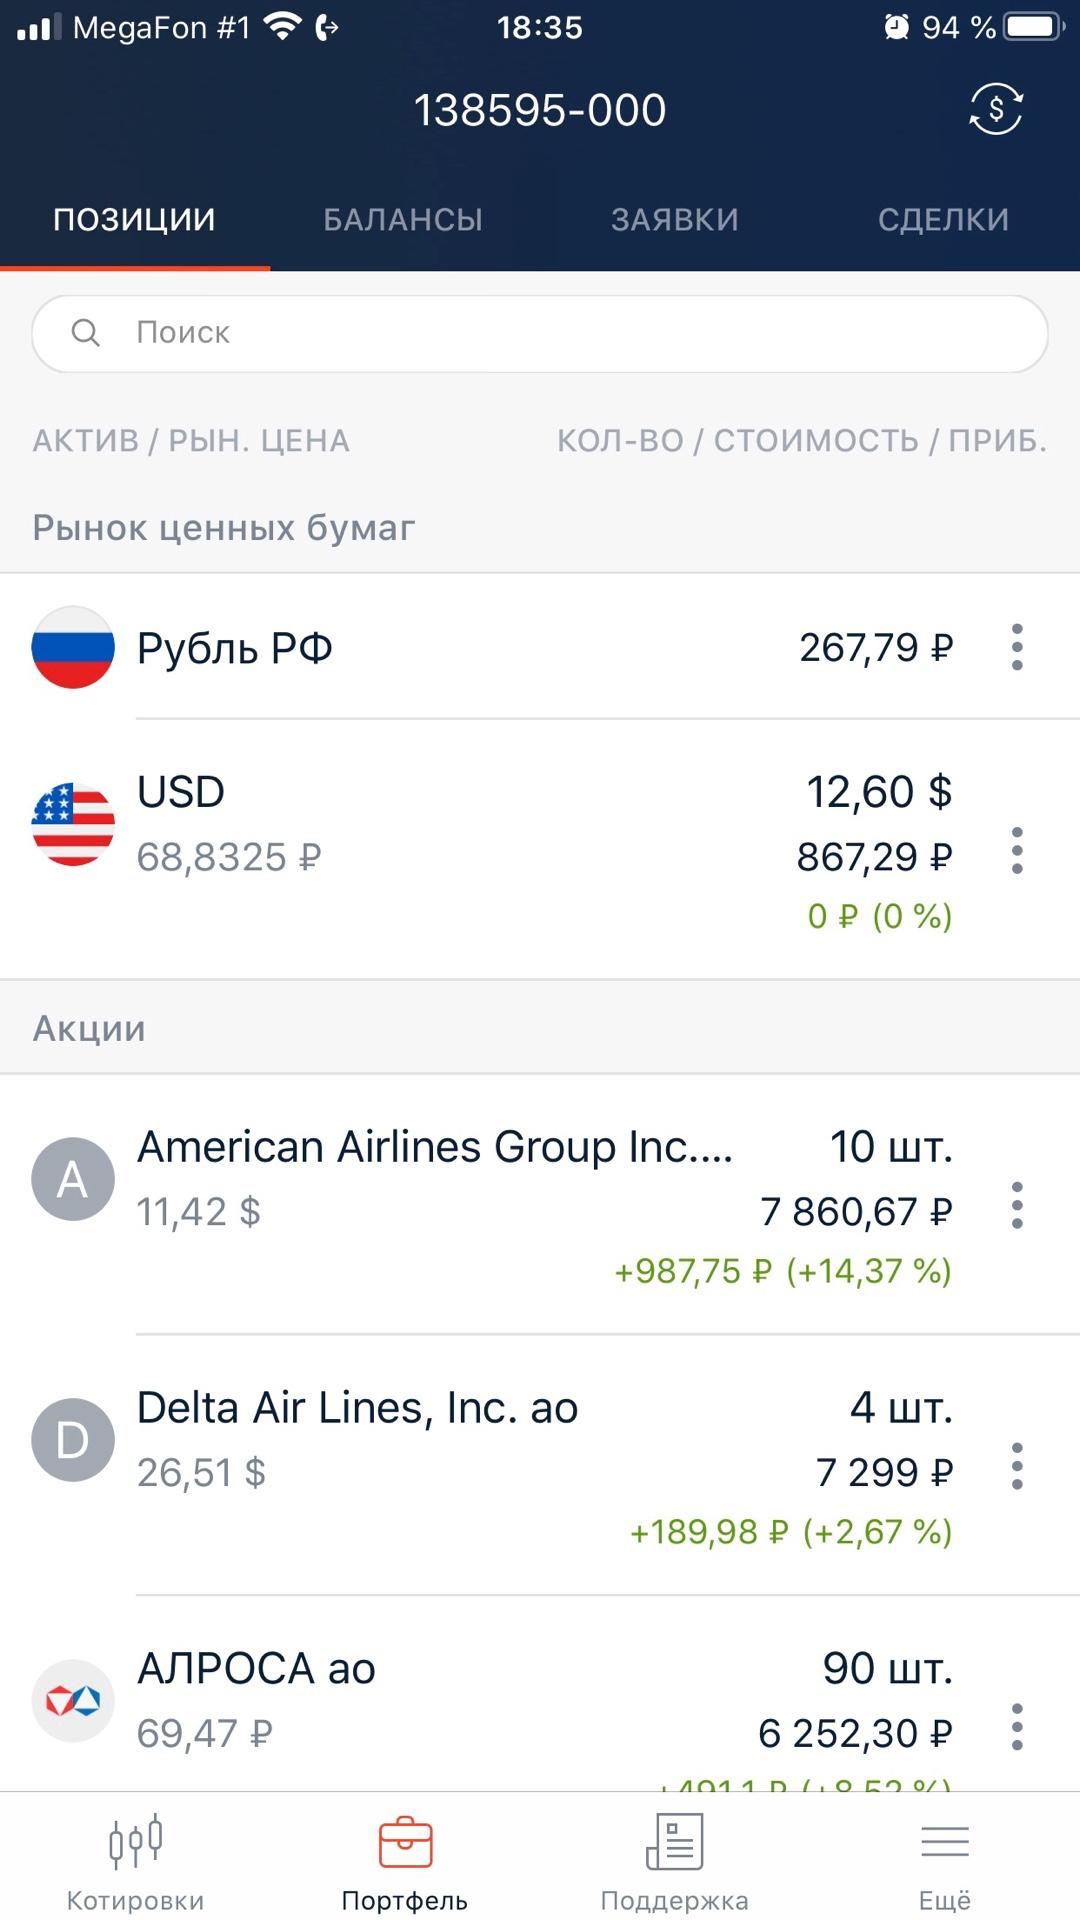 Акции американских авиакомпаний